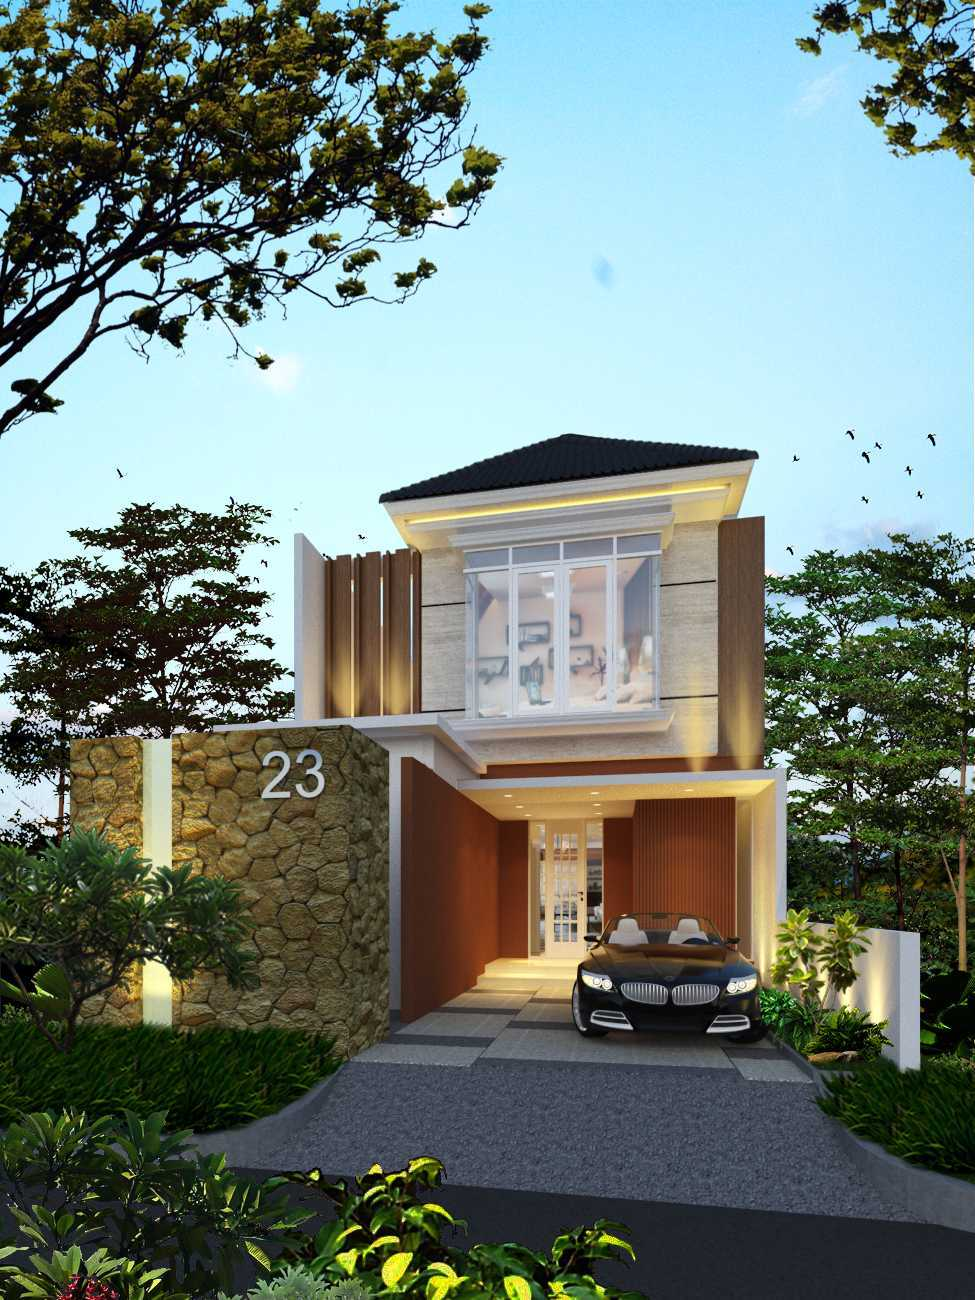 Sense Studio Residence - Surabaya Surabaya, Kota Sby, Jawa Timur, Indonesia Surabaya, Kota Sby, Jawa Timur, Indonesia Sense-Studio-Rumah-Tinggal-Kertomenanggal  51649